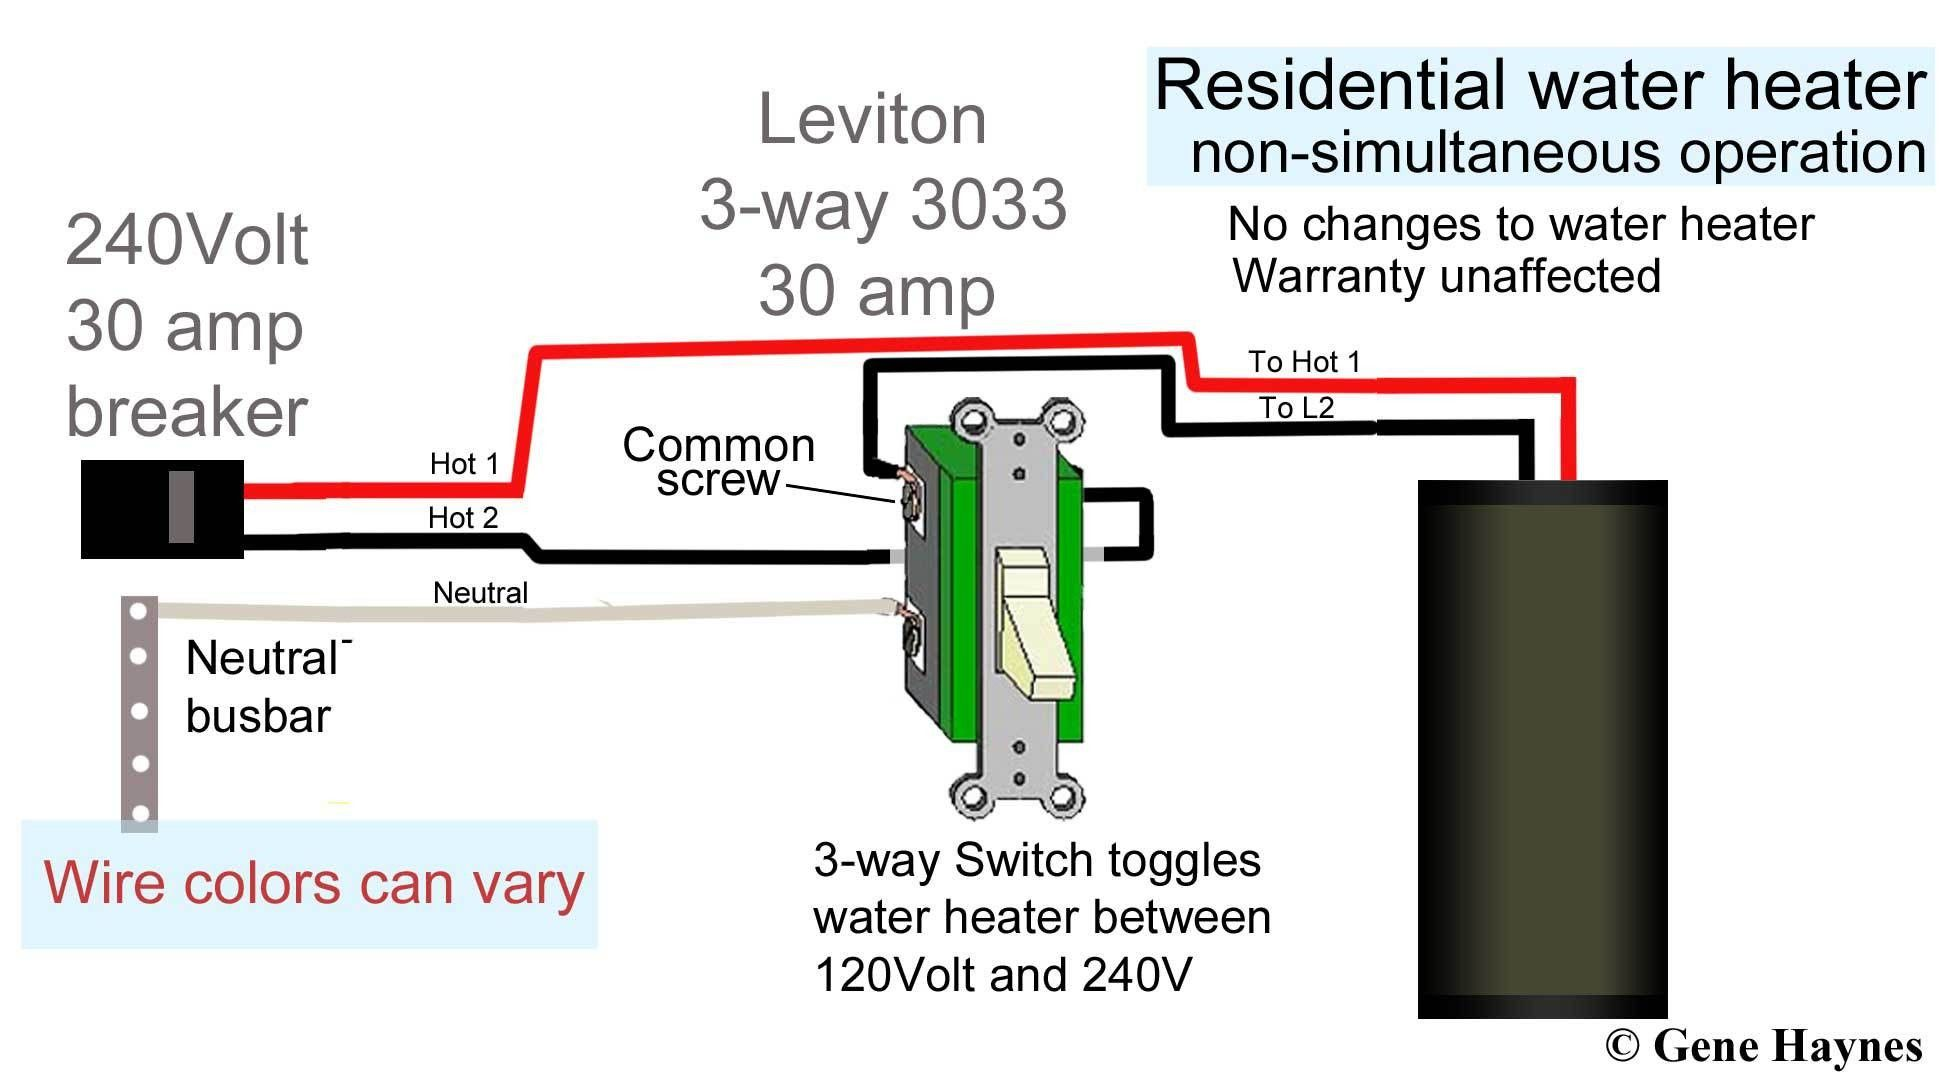 Unique Light Switch Connection Diagram Diagram Wiringdiagram Diagramming Diagramm Visuals Visualisation Gr Light Switch Wiring Leviton Thermostat Wiring